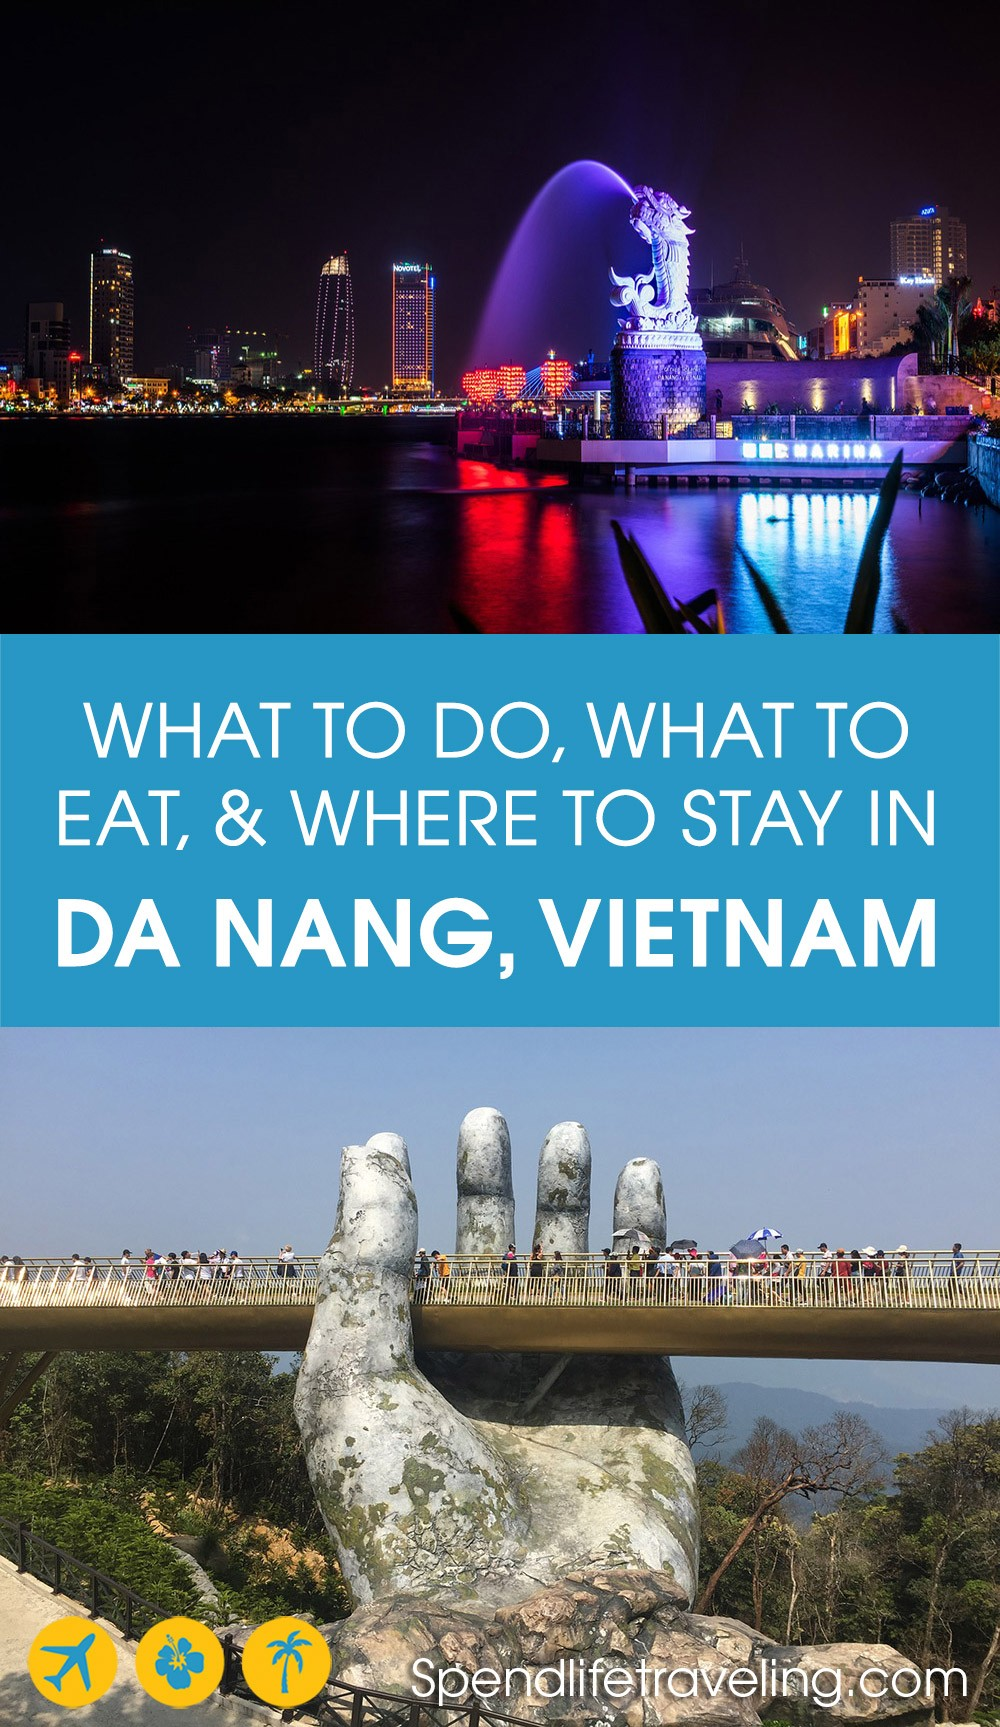 A practical Da Nang 2 day itinerary